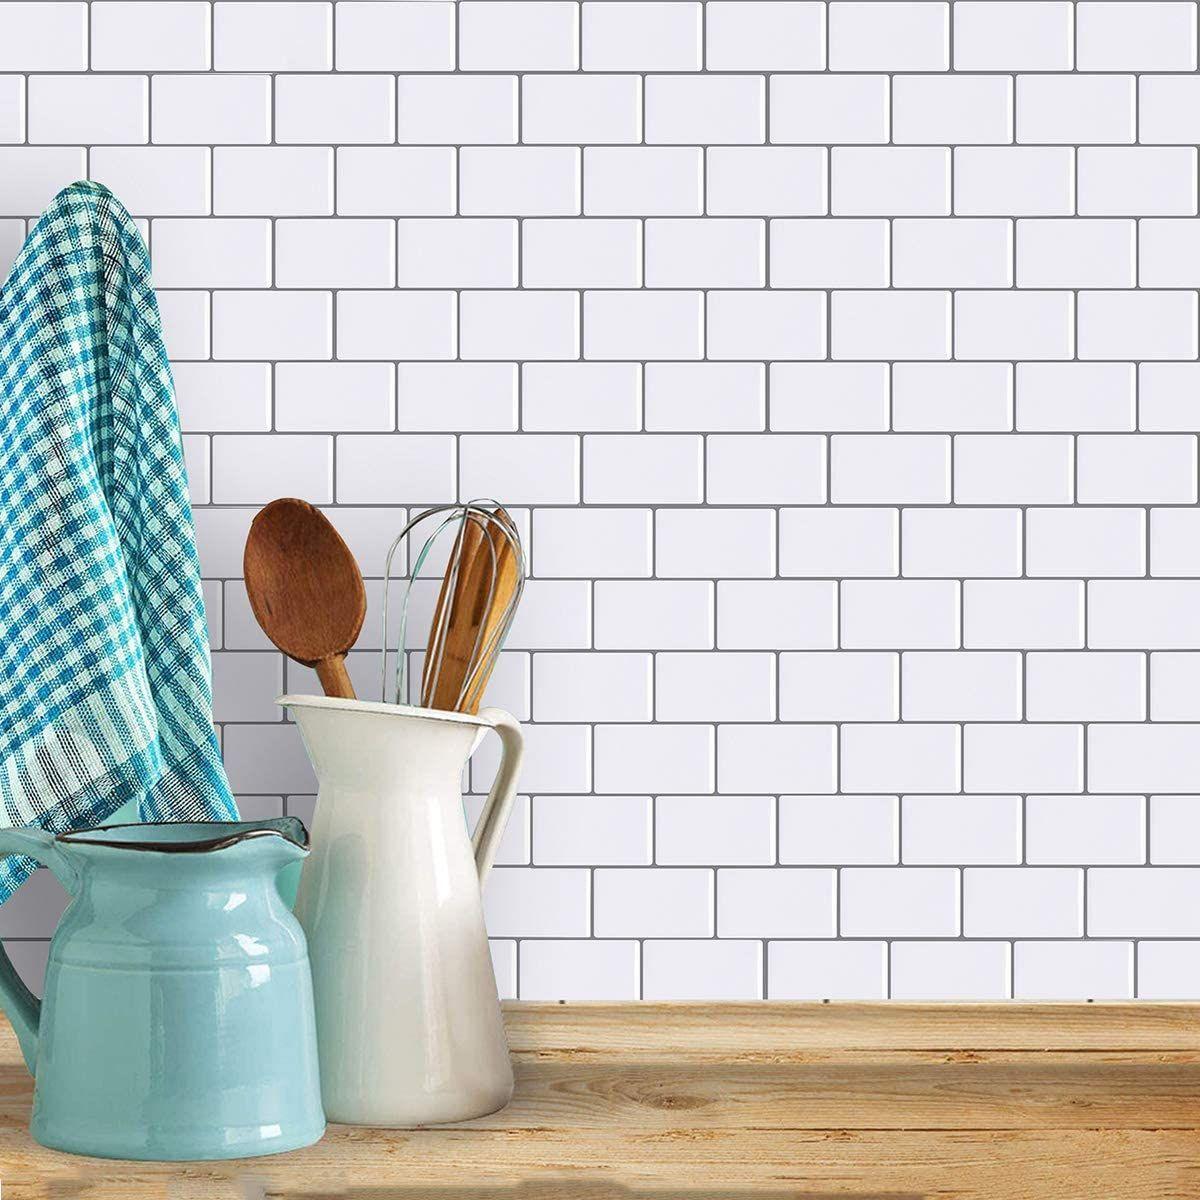 Hyfanstr Peel And Stick Wall Tiles Backsplash For Kitchen Self Adhesive Stick On Tiles Splashback 3d Subway Tile Splashback Tile Backsplash Splashback Tiles